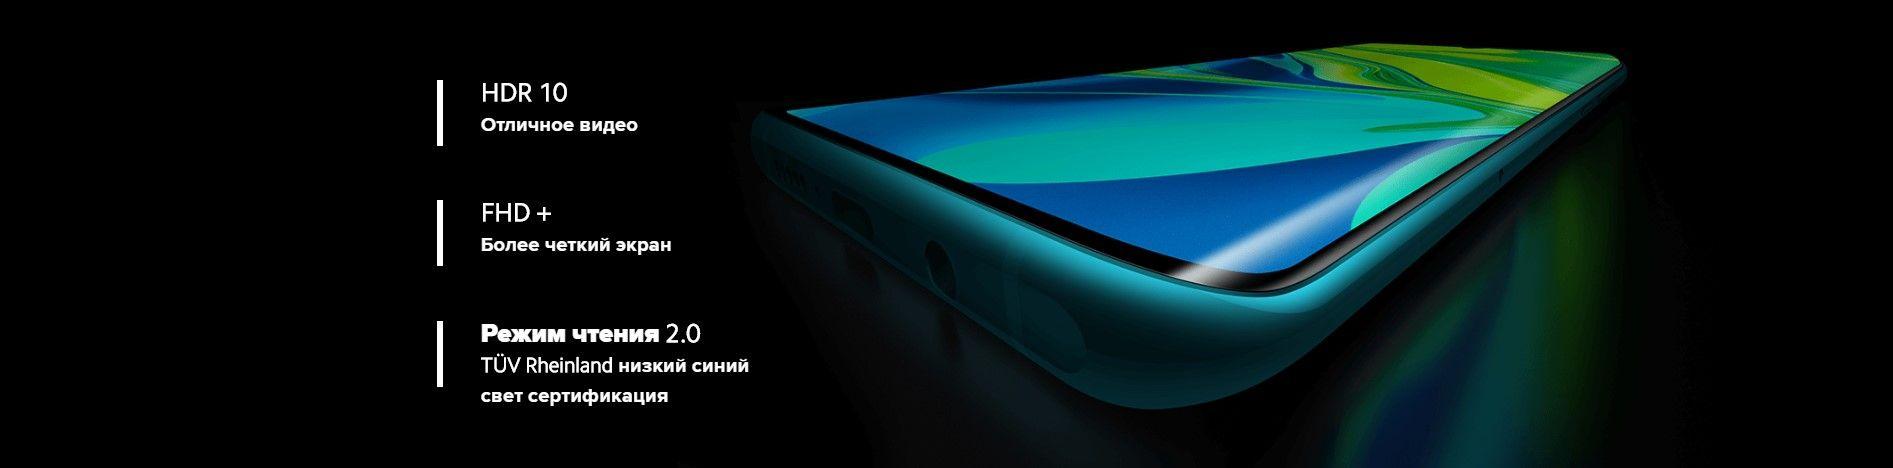 Xiaomi Mi Note 10 гиперболический дисплей